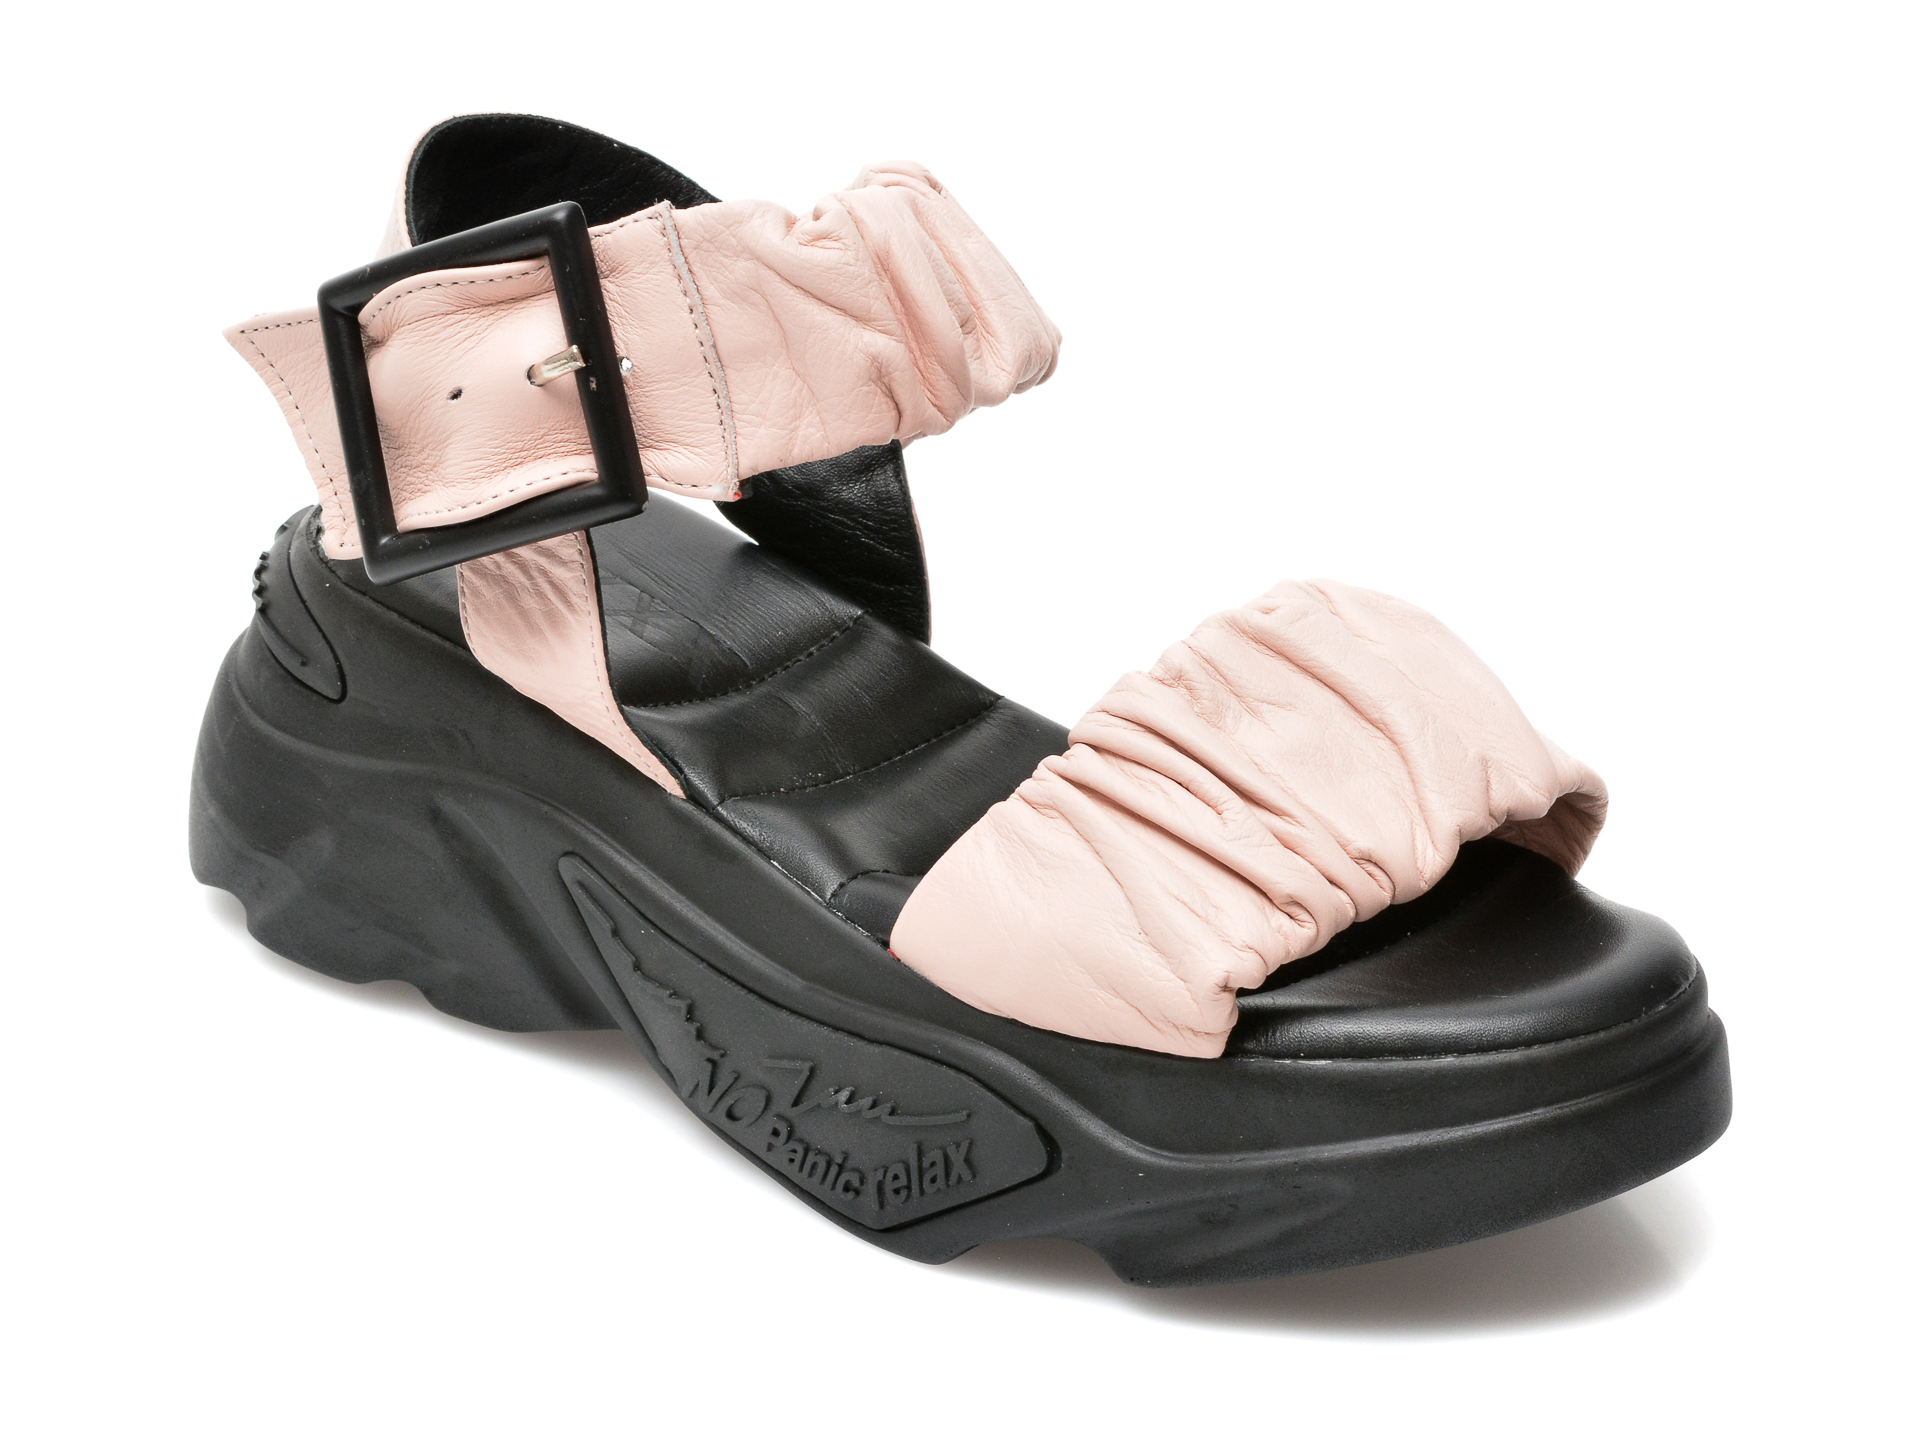 Sandale GRYXX nude, 180G32, din piele naturala